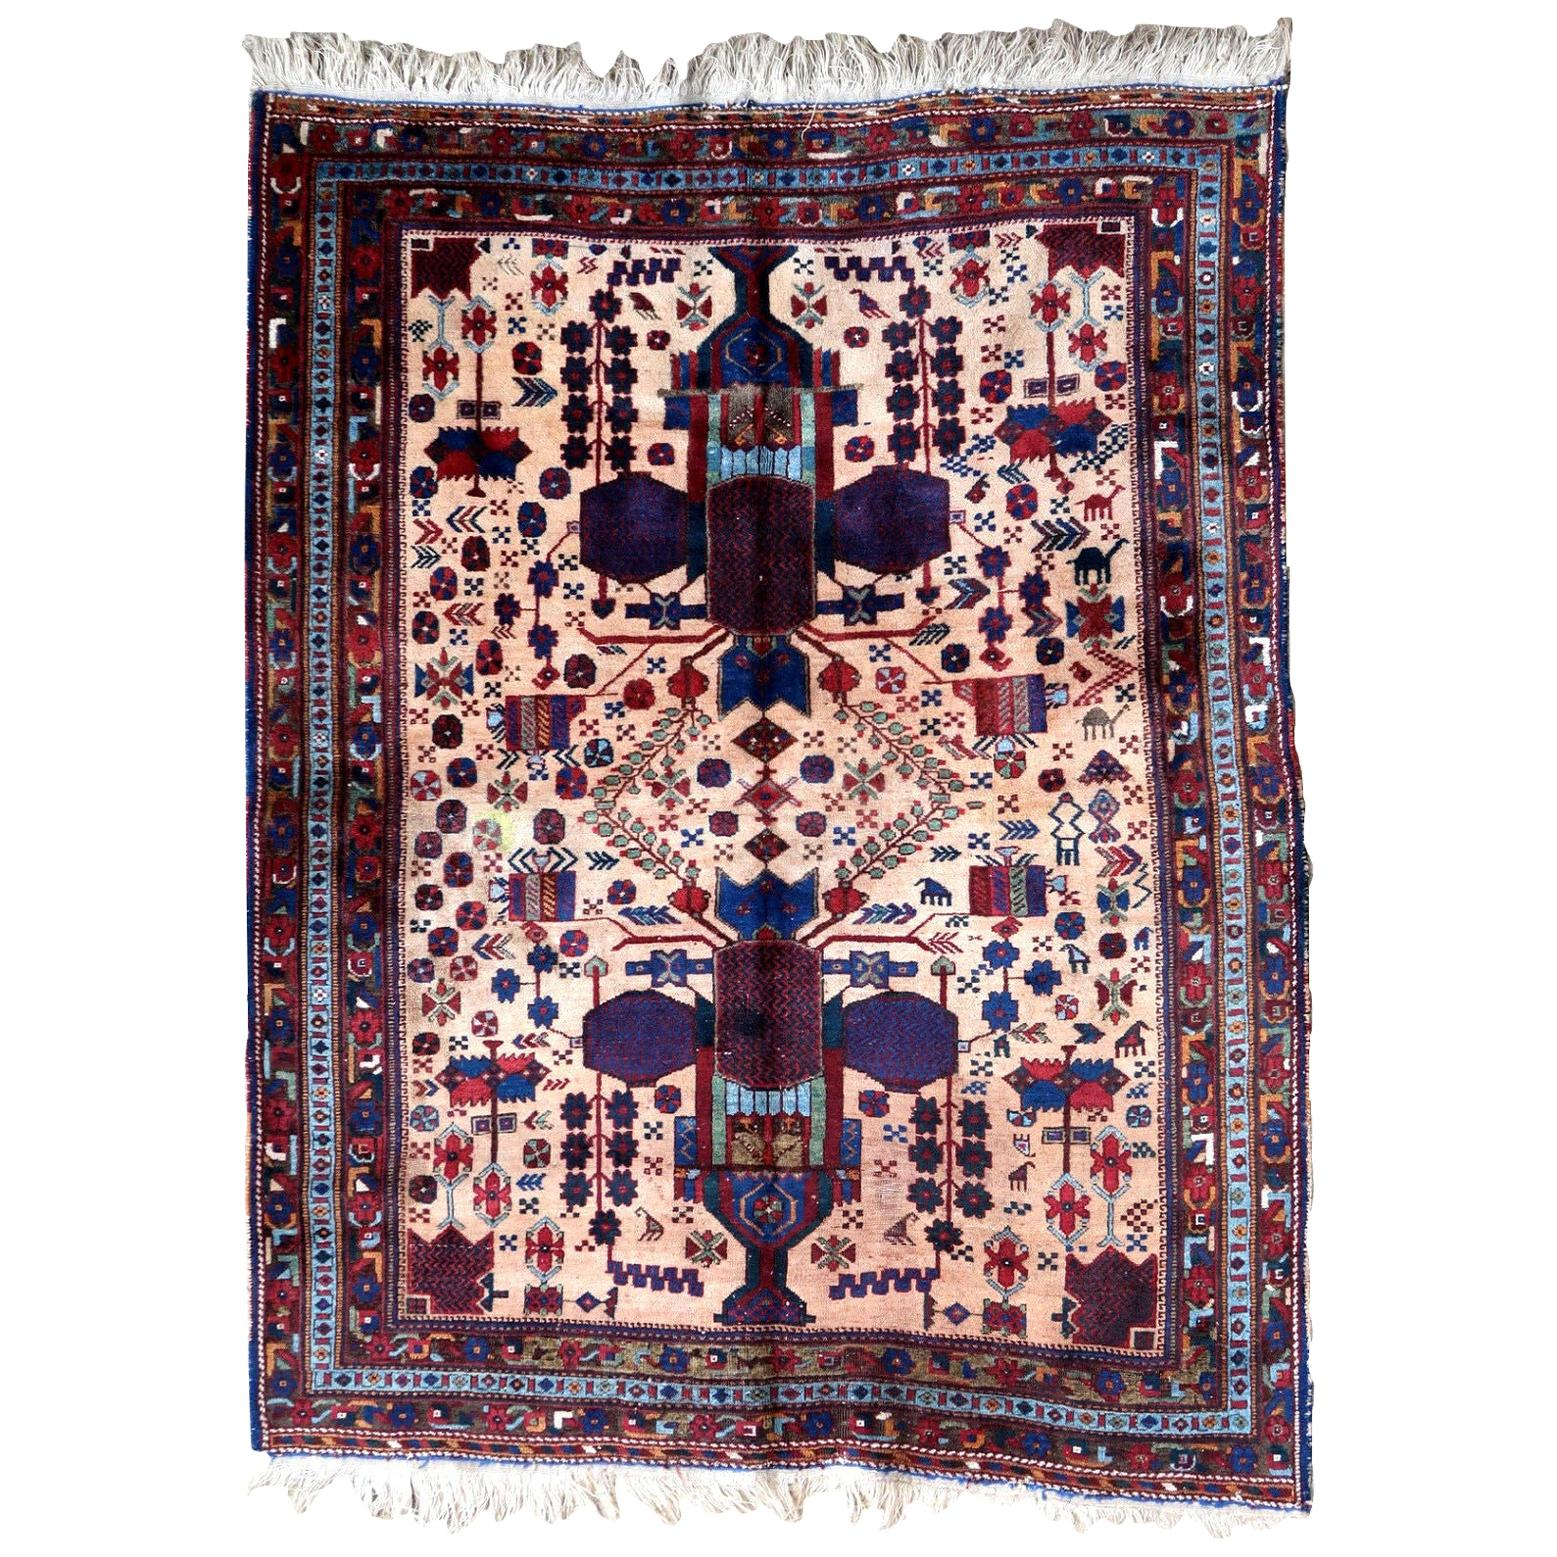 Handmade Antique Afshar Style Rug, 1930s, 1P67